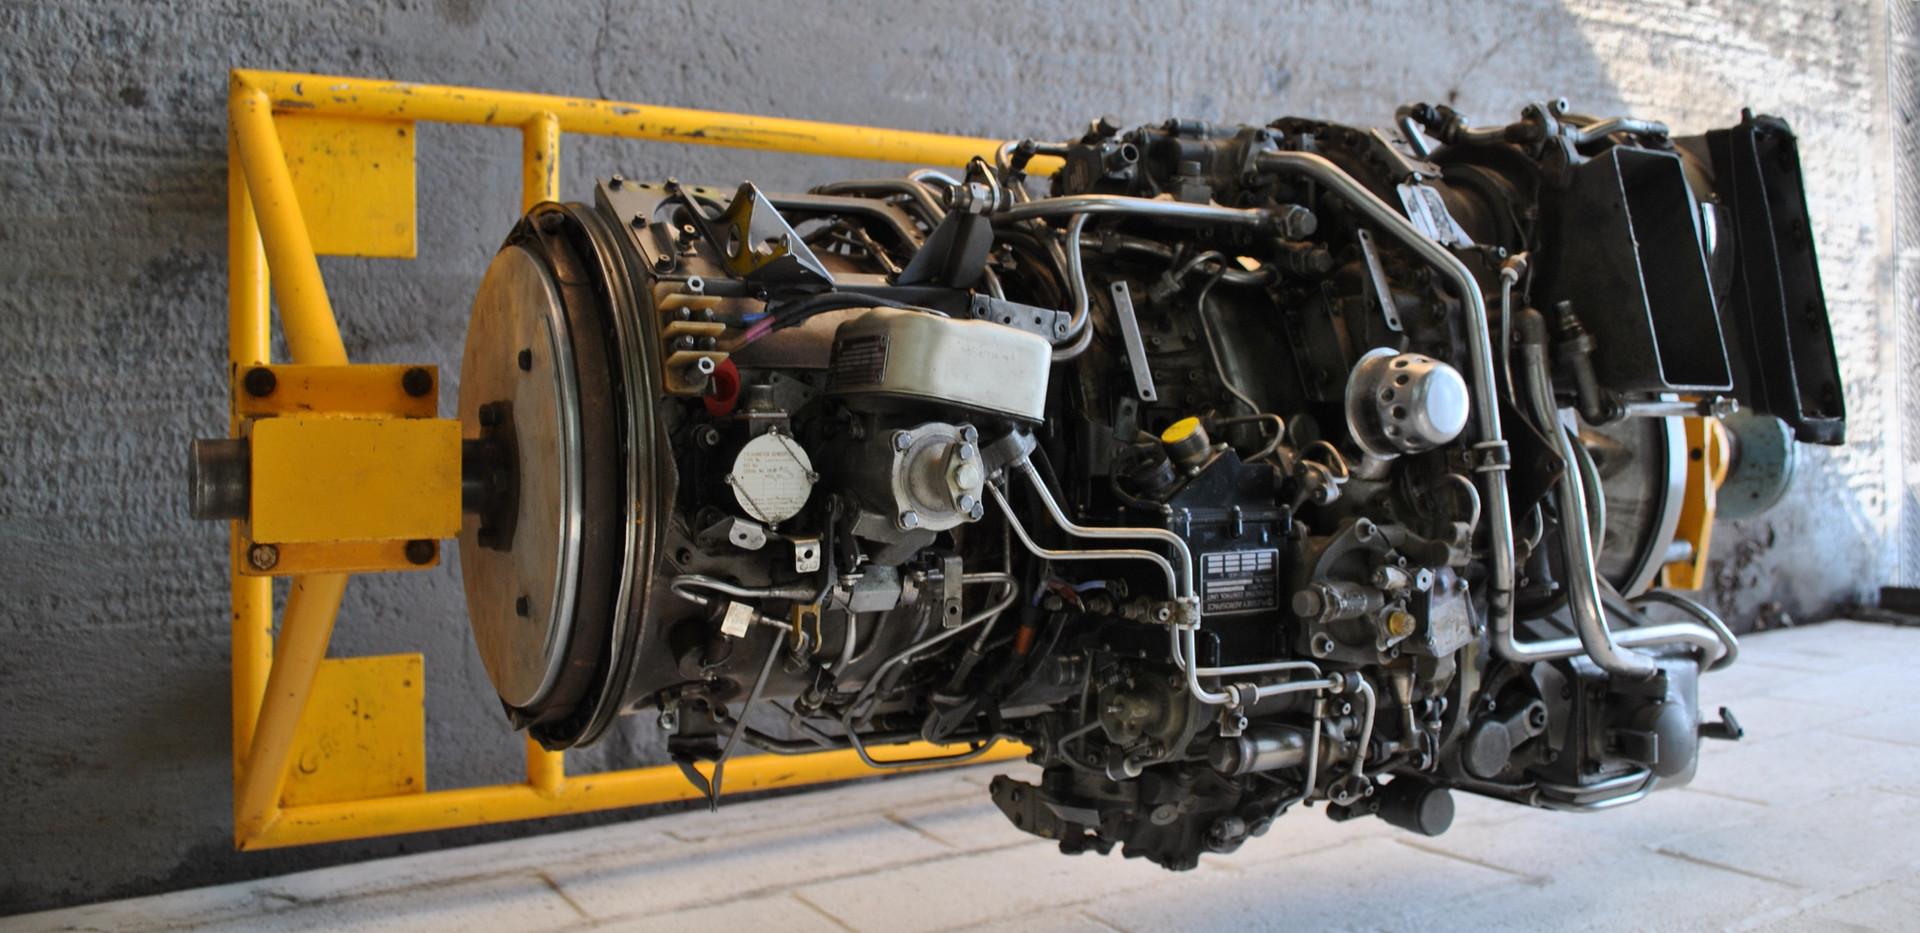 Rolls Royce Gem Engine in Stand (14).JPG